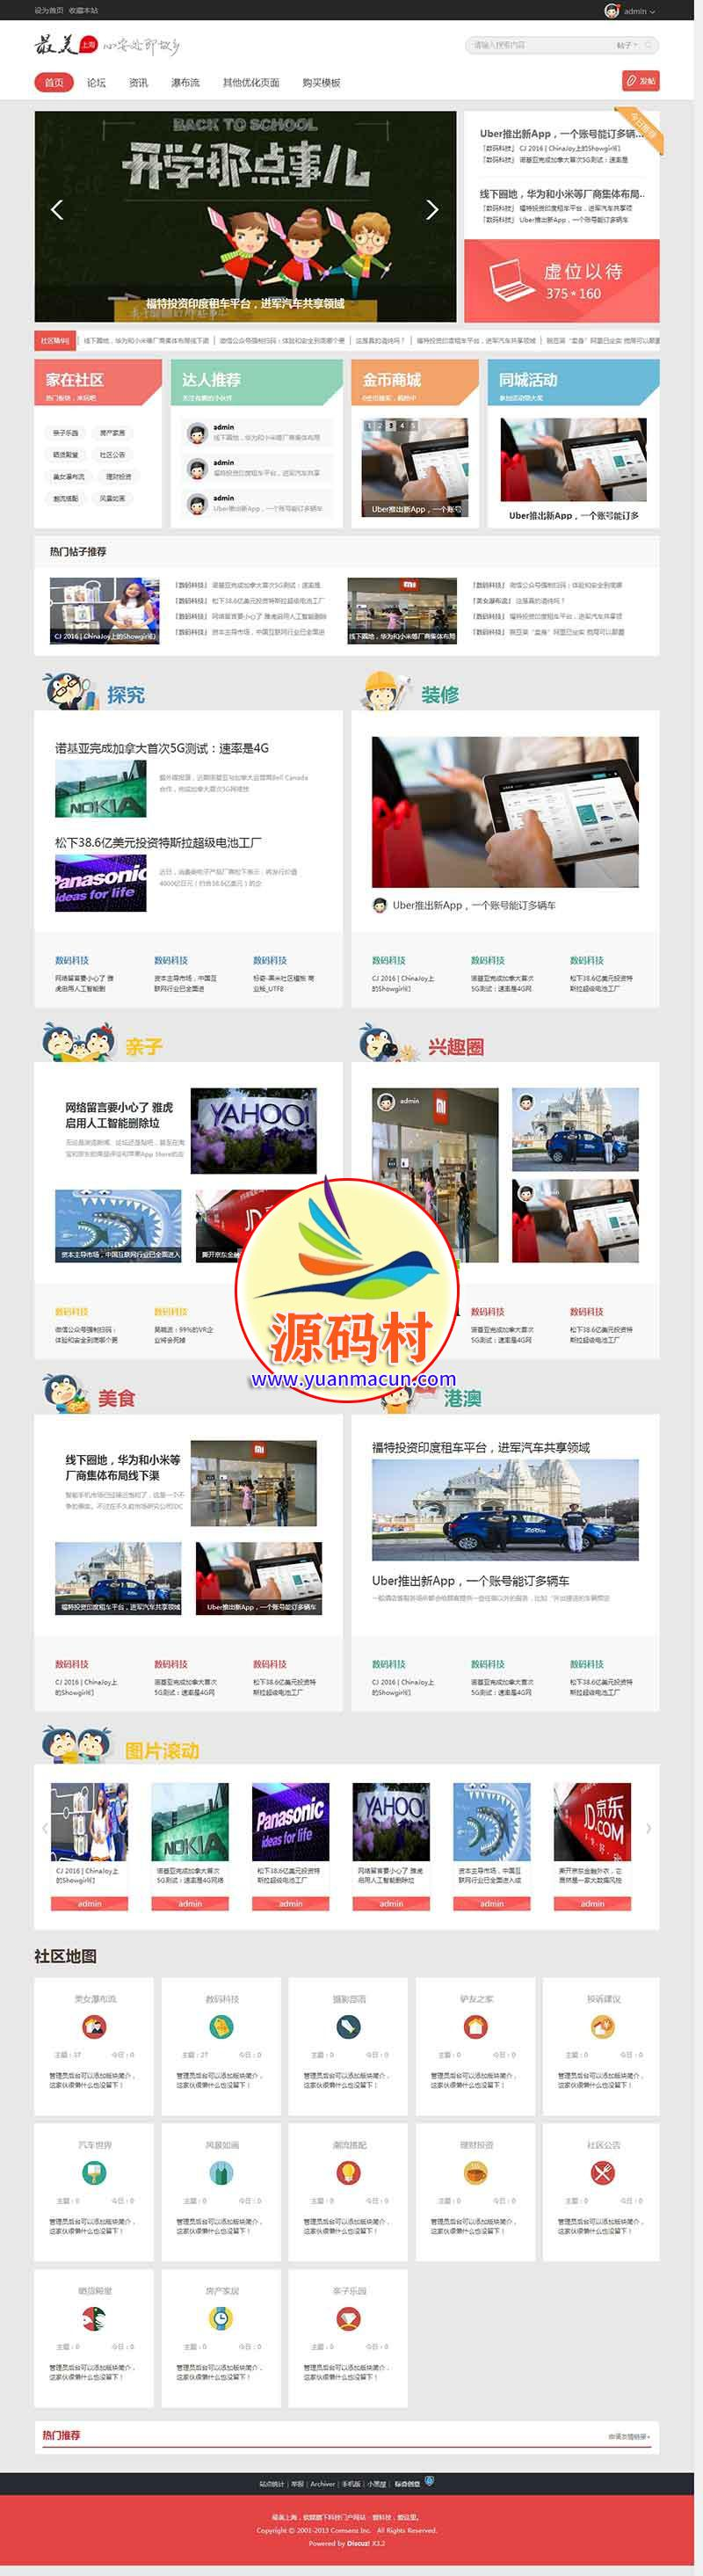 discuz模板最美上海城市社区商业版生活信息新门户论坛dz模板 价值288元